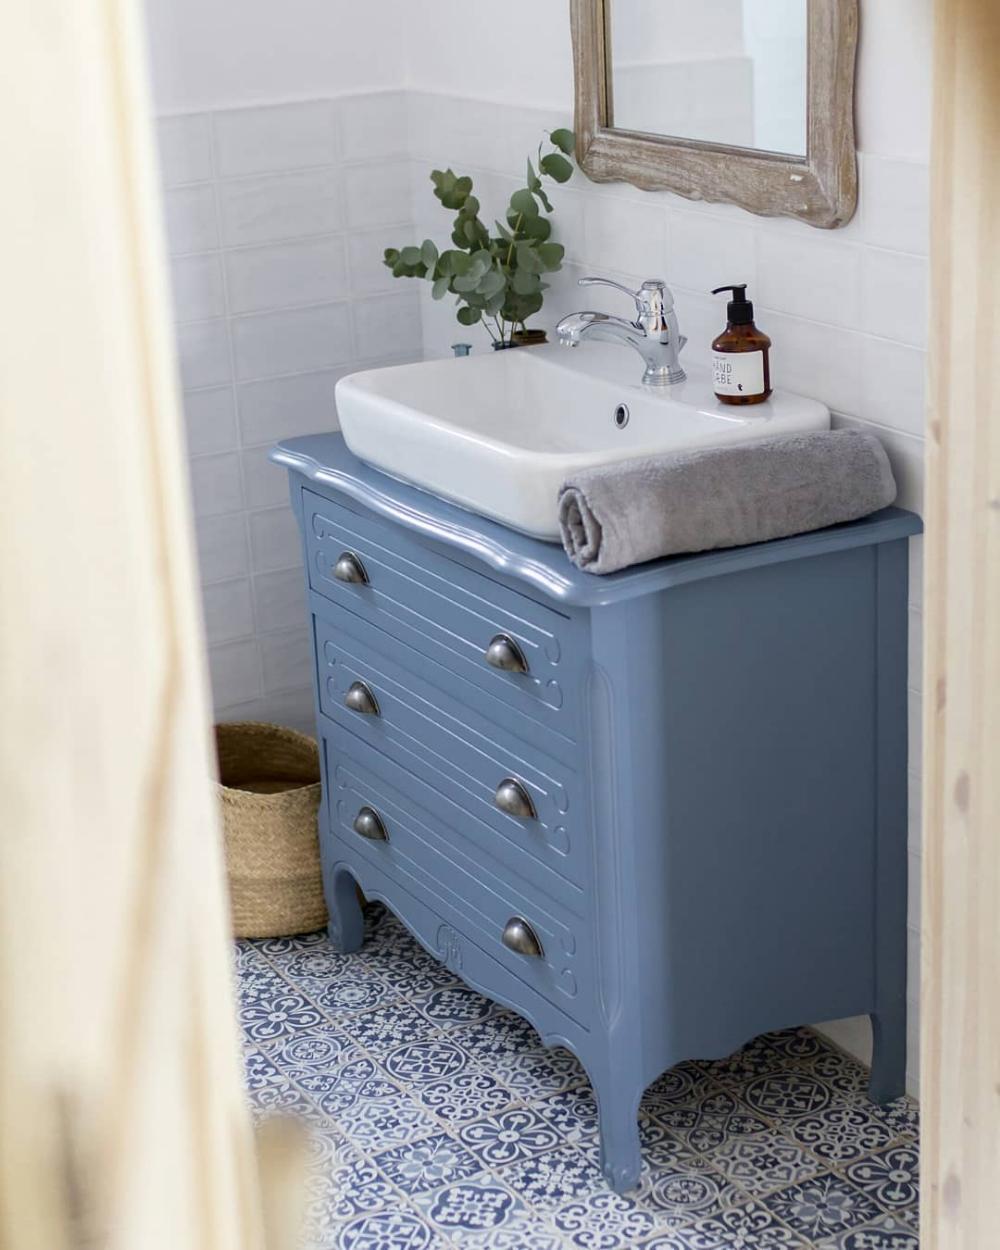 Top 7 Fresh Bathroom Trends 2020 Great Ideas For New Season 44 Photos In 2020 Bathroom Trends